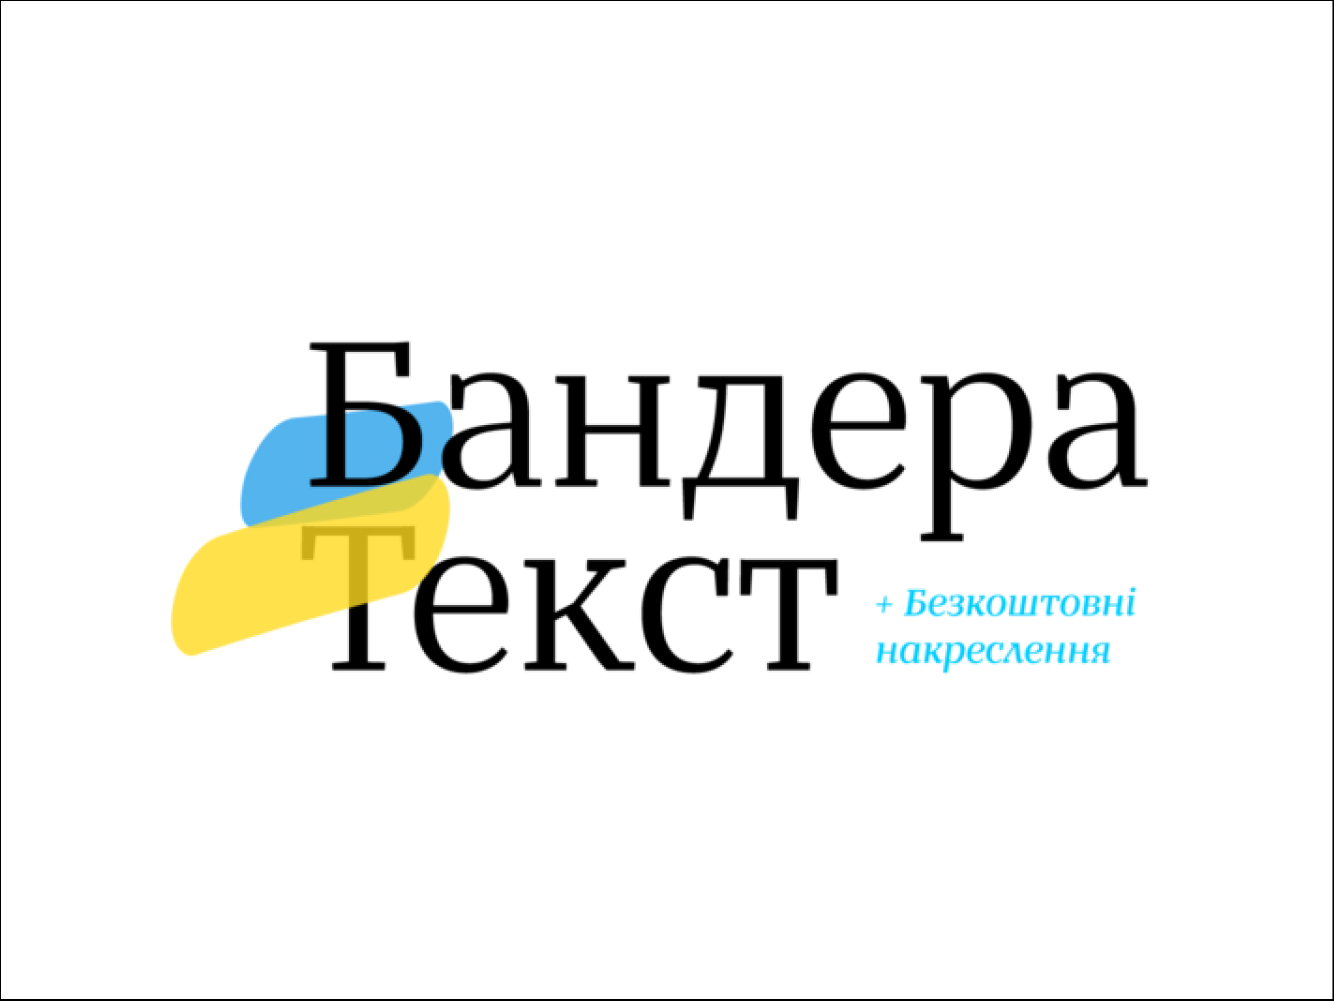 Bandera Text Cyrillic